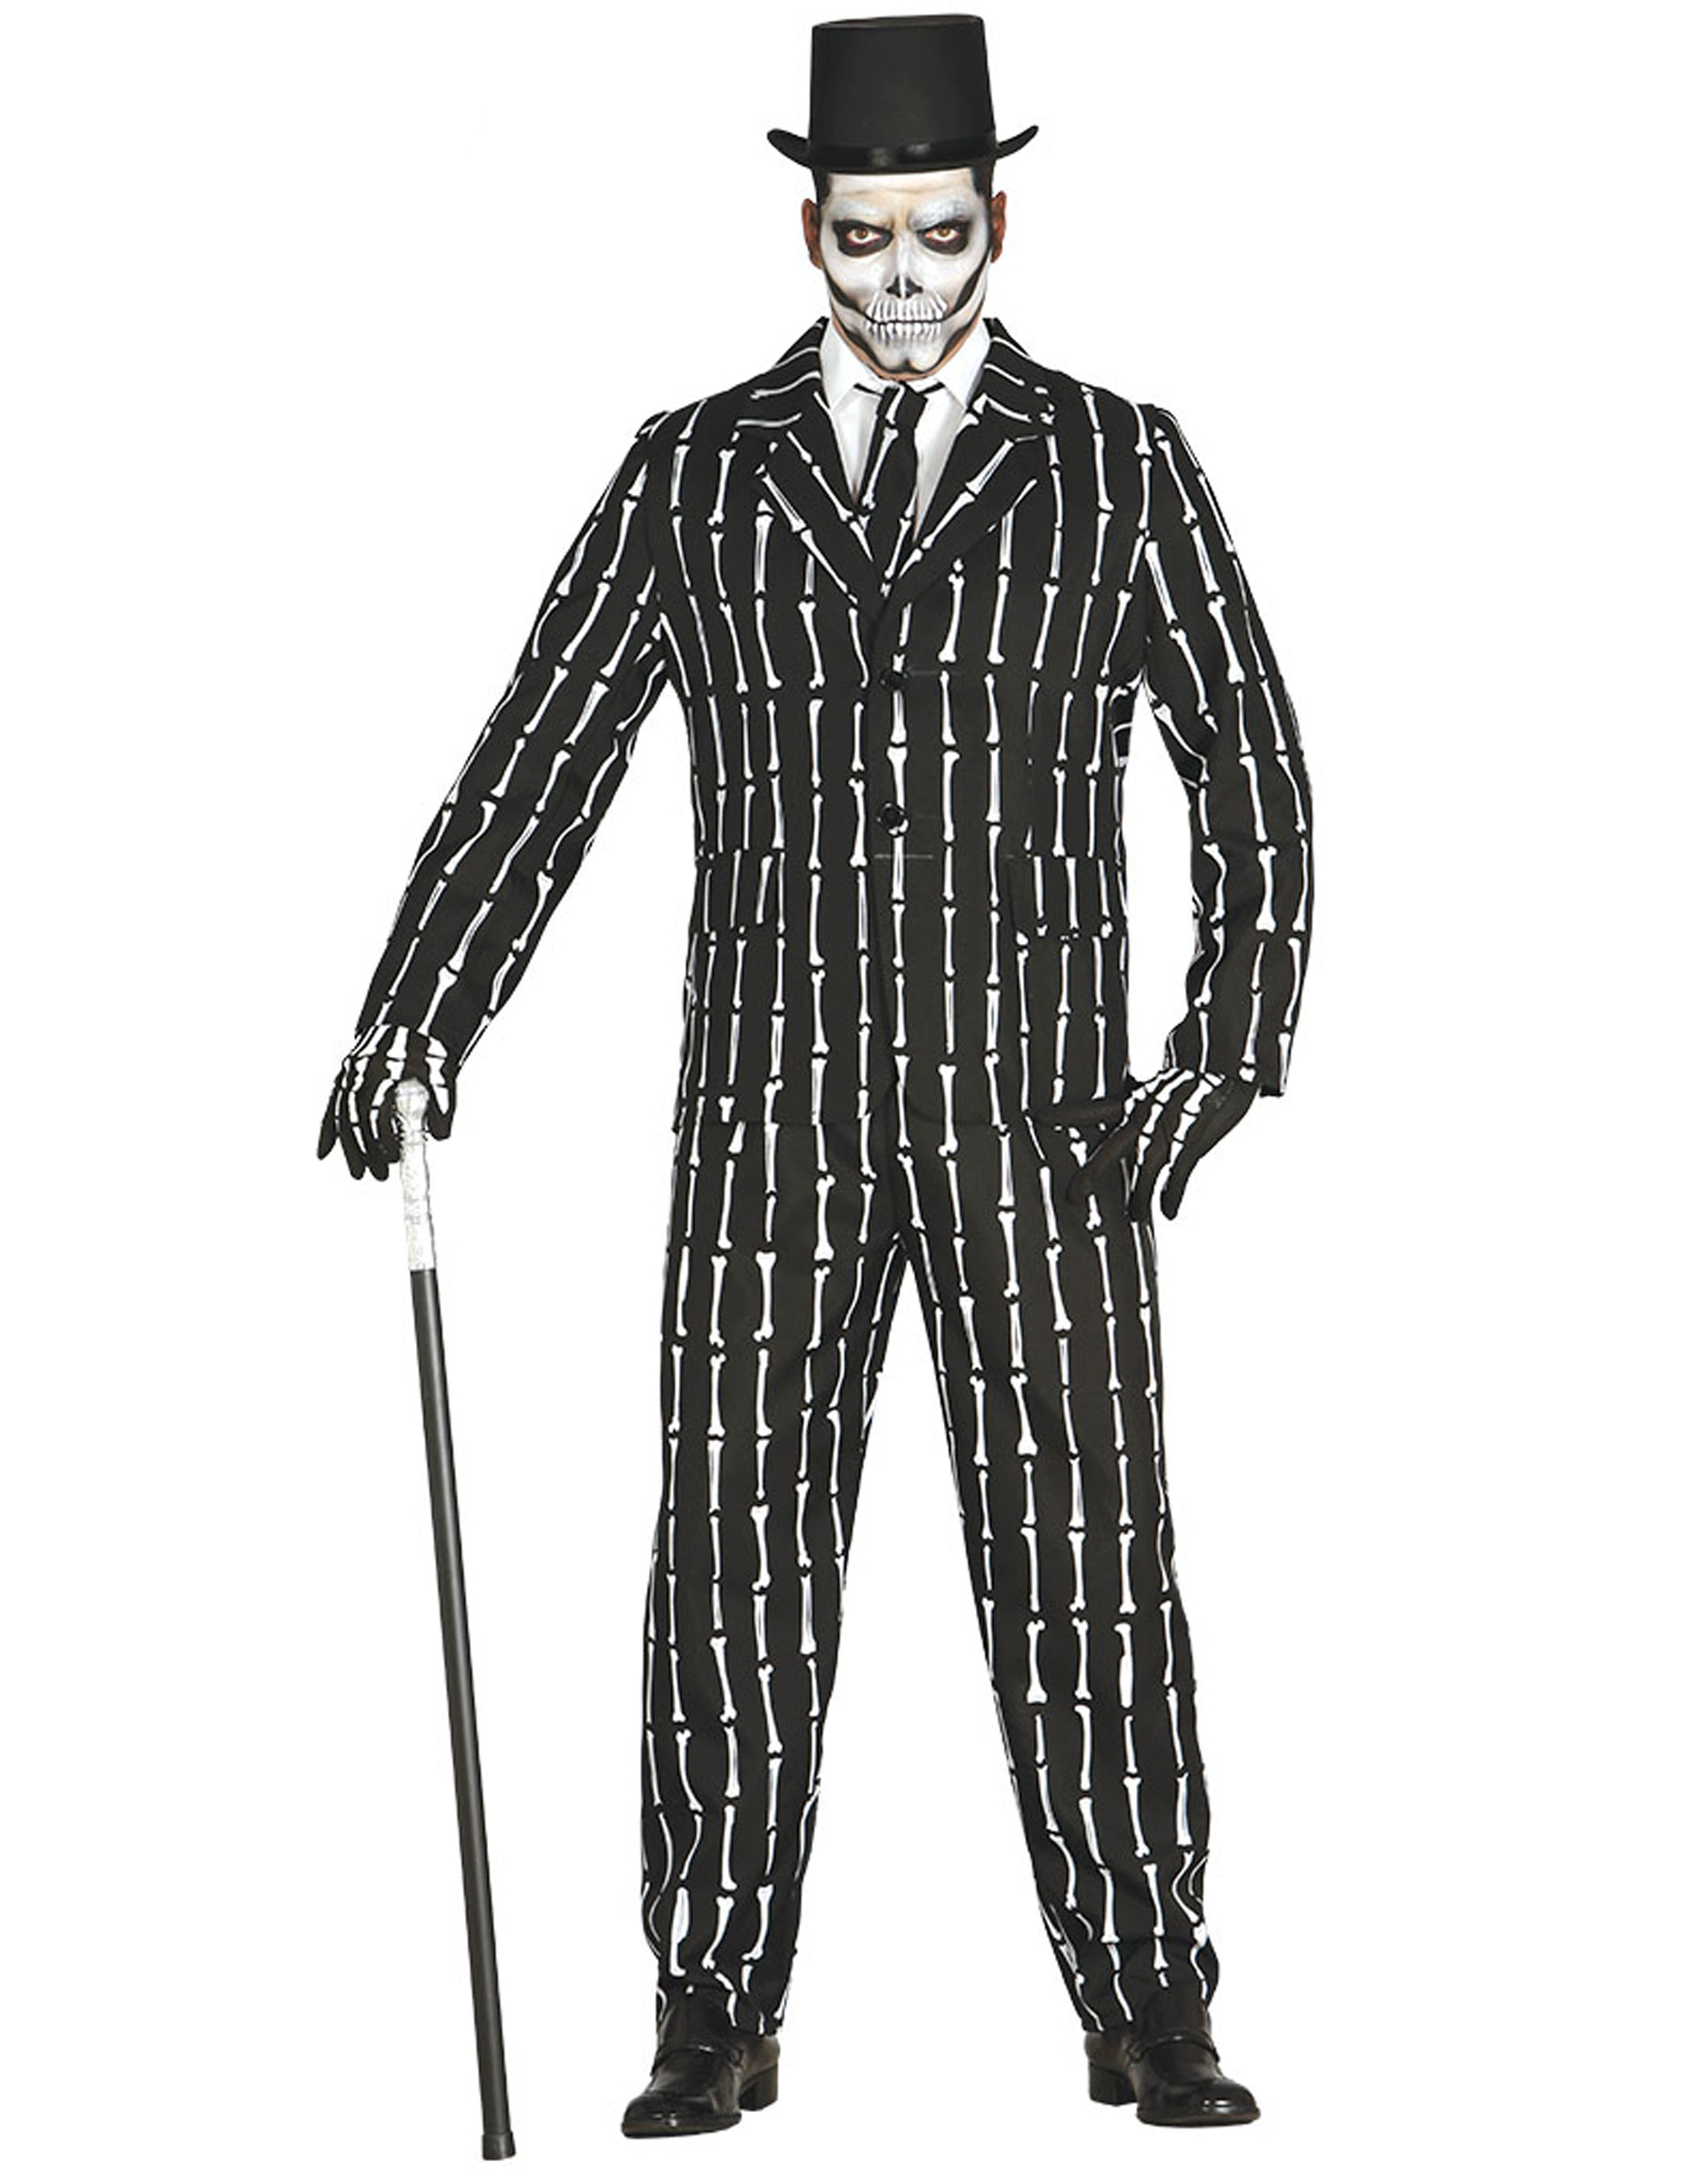 anzug skelett f r herren kost me f r erwachsene und g nstige faschingskost me vegaoo. Black Bedroom Furniture Sets. Home Design Ideas